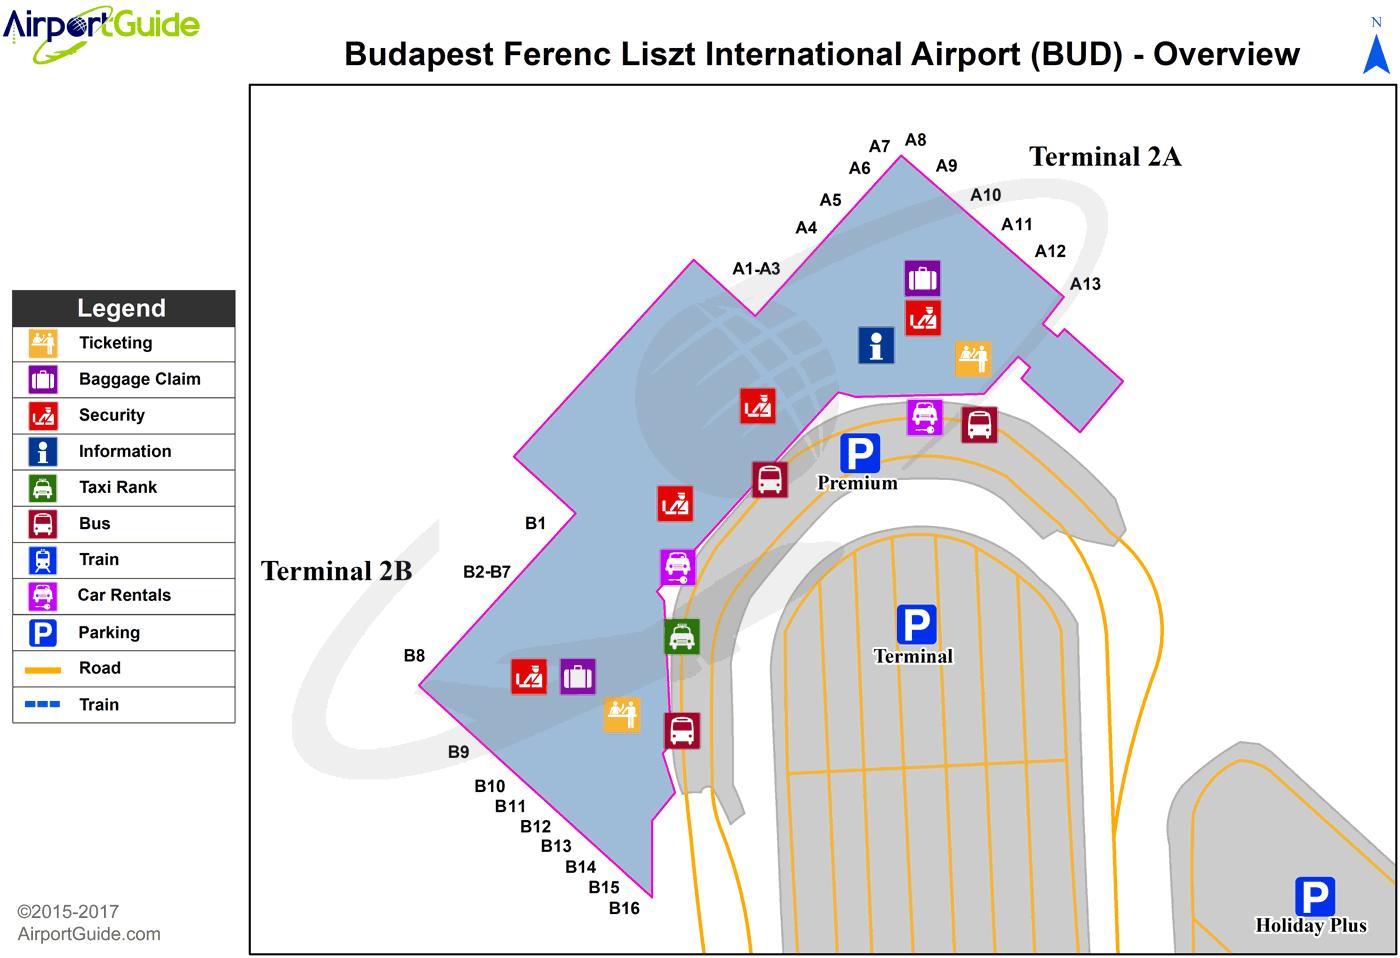 A Budapest Airport Terminal Terkep Budapest Airport Terkep